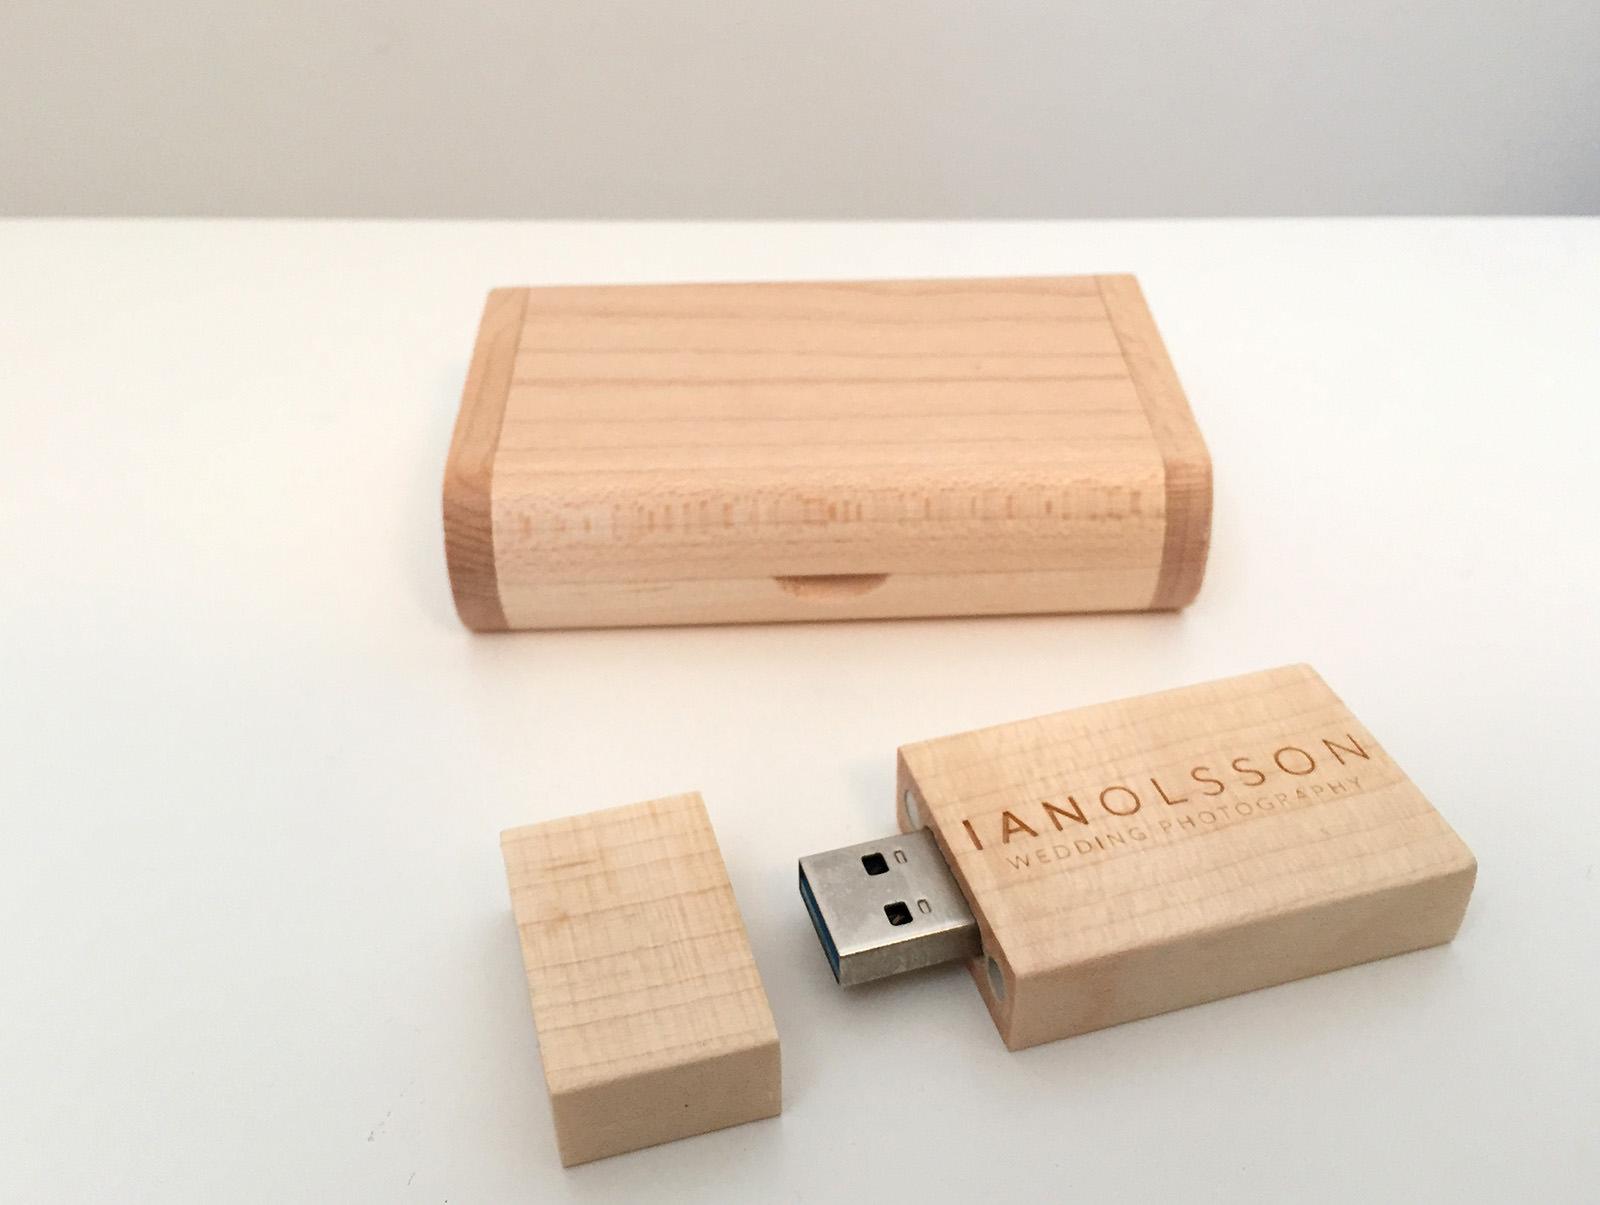 Wedding USB of high resolution photos in presentation wooden box